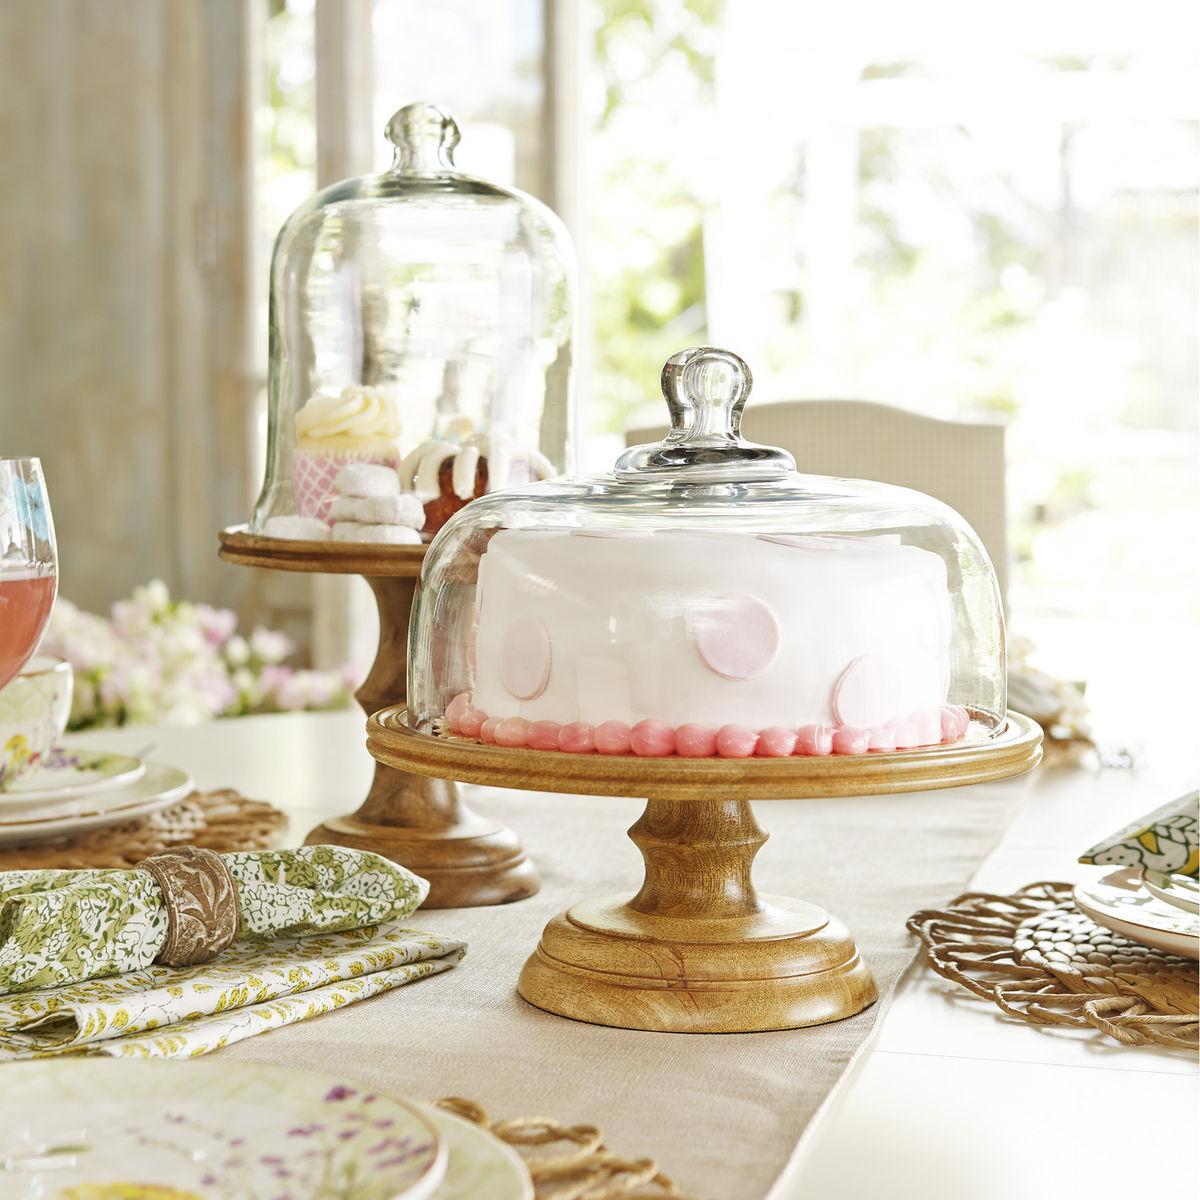 Wood cake cloche